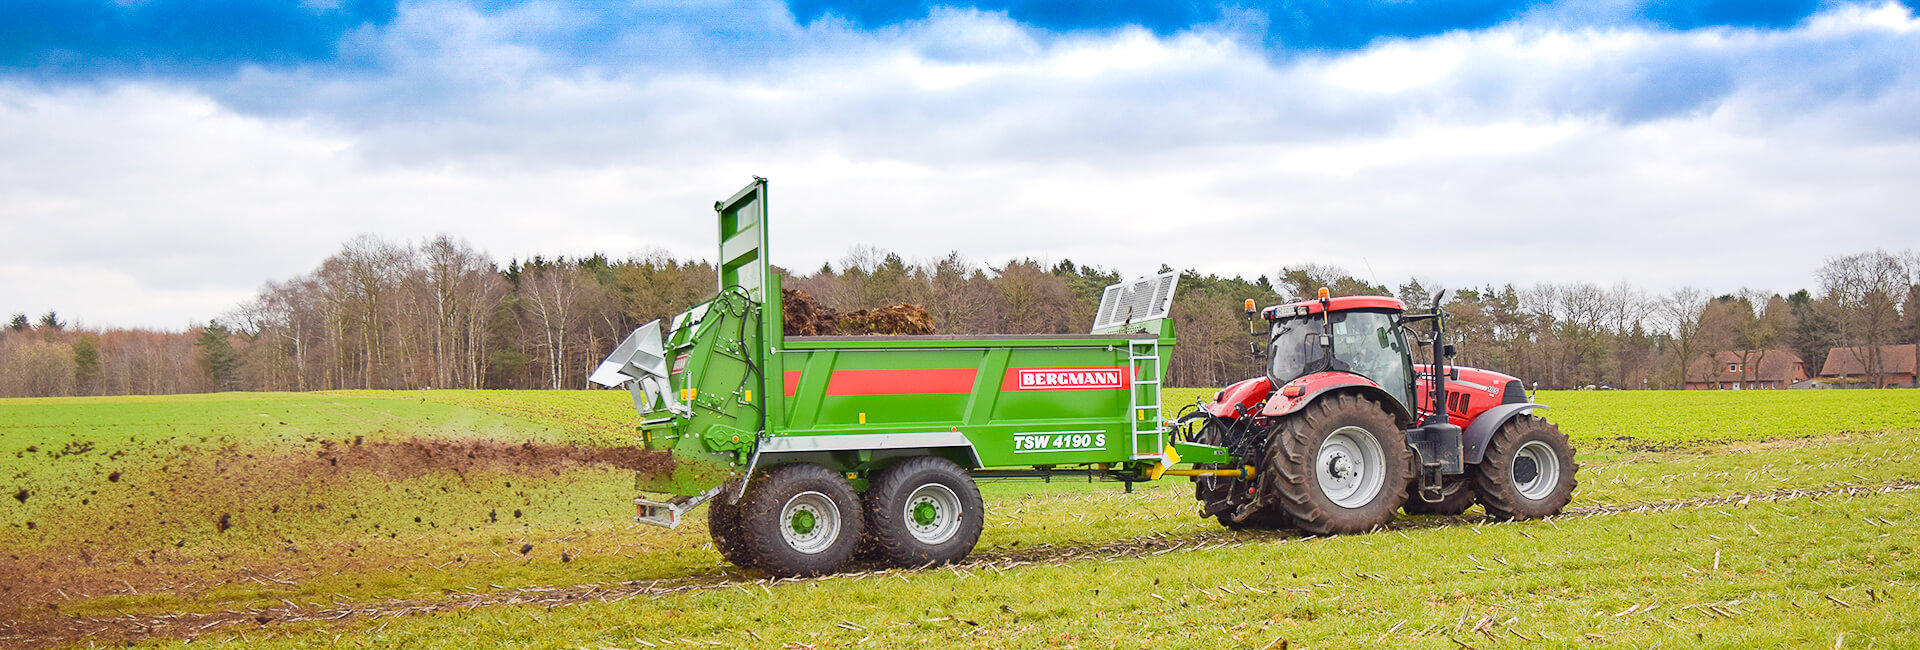 Bergmann muck spreader top dressing a crop with manure